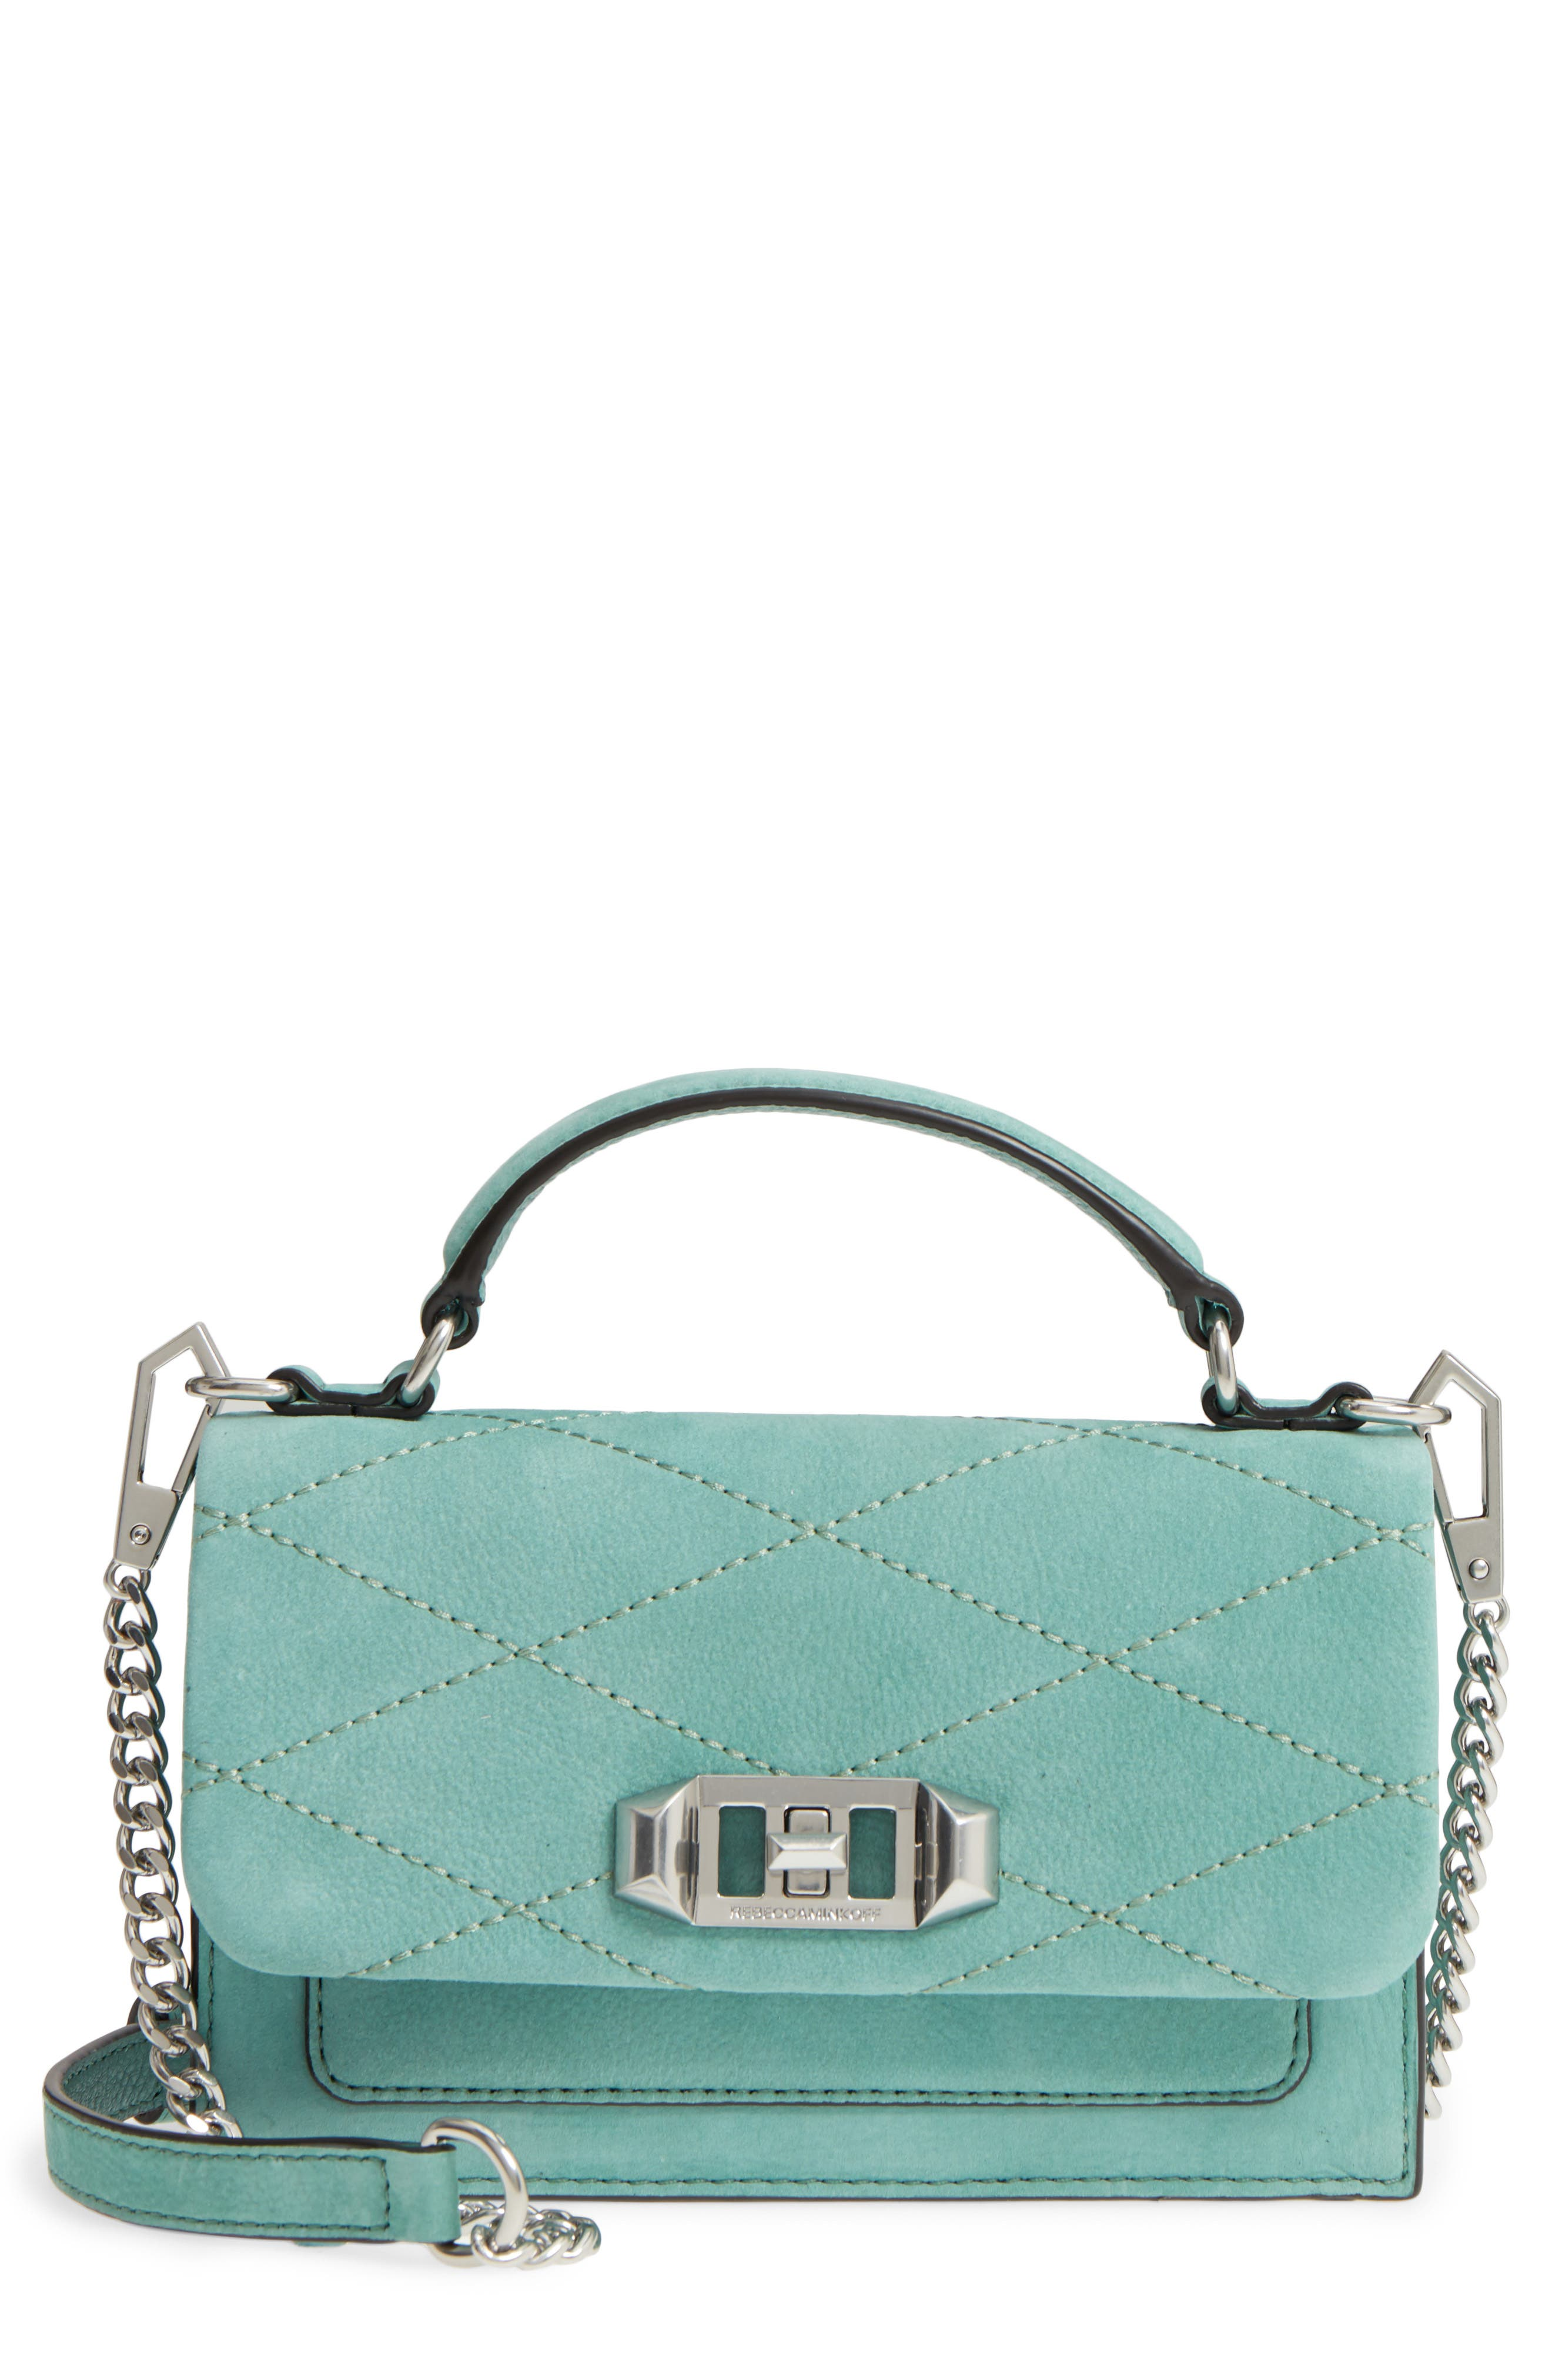 Main Image - Rebecca Minkoff Small Je T'aime Leather Crossbody Bag